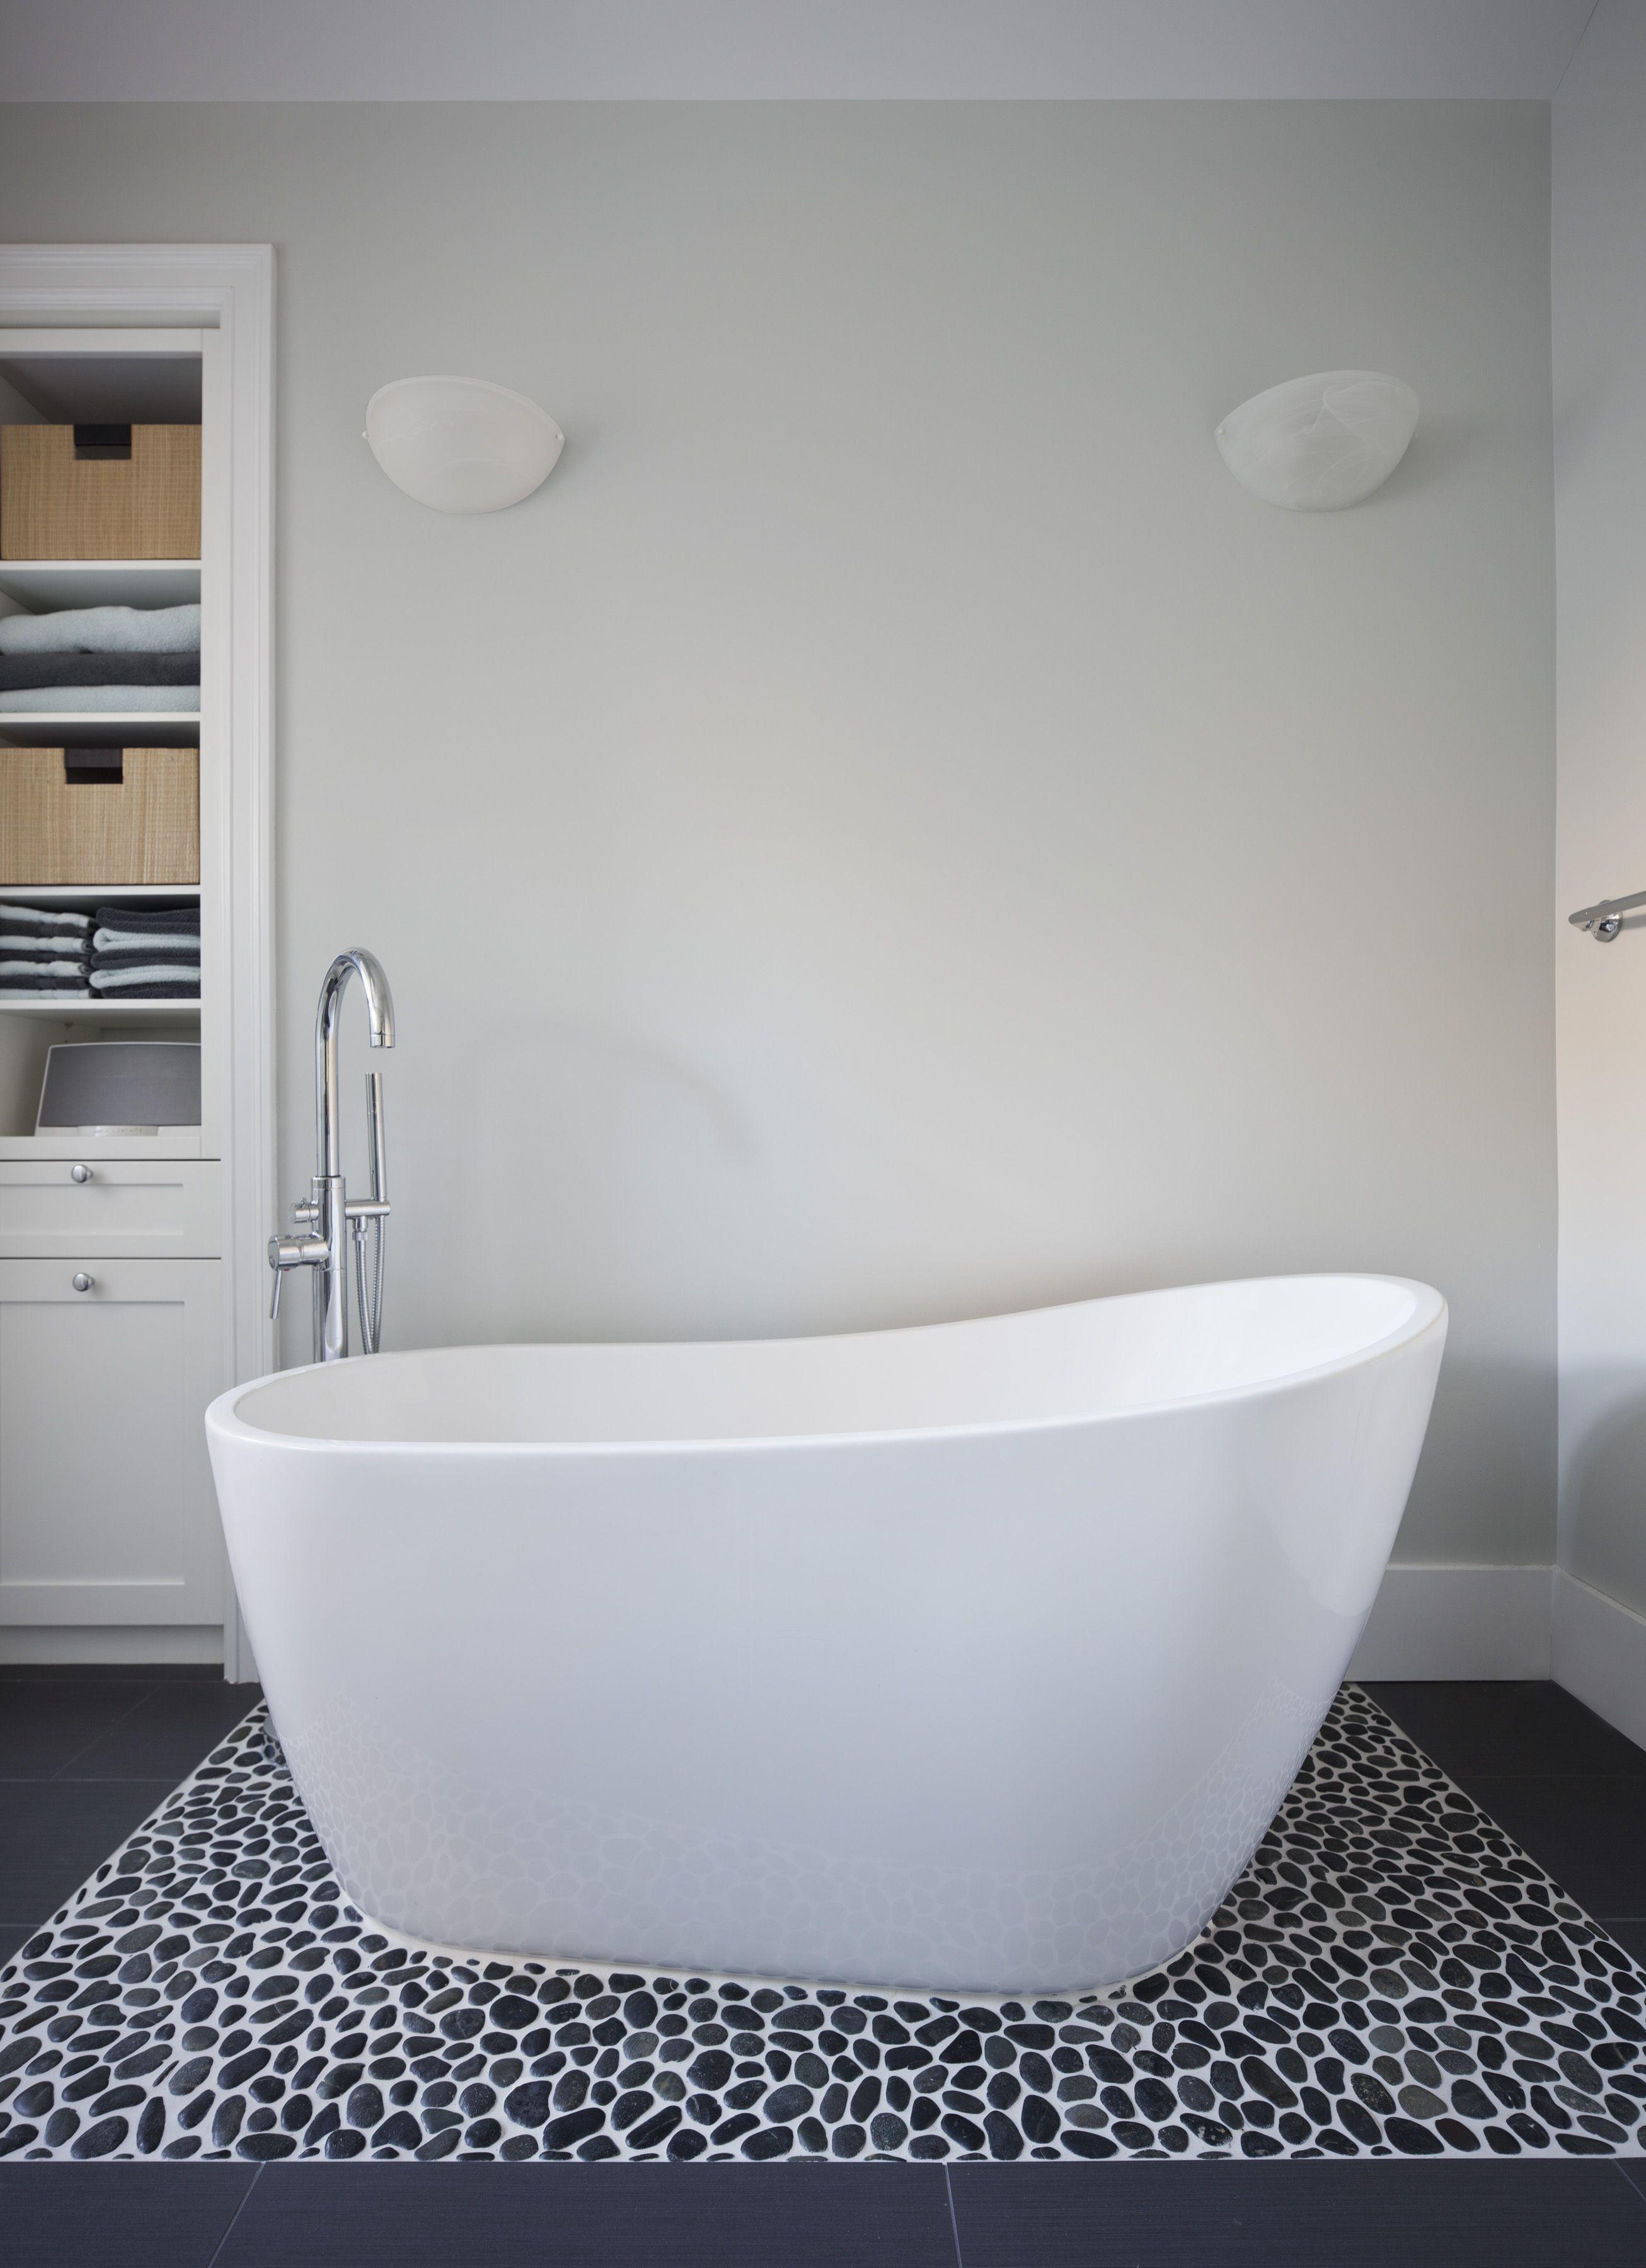 Soaking tub and river rock tile | Portage Bay Playroom and More by ...